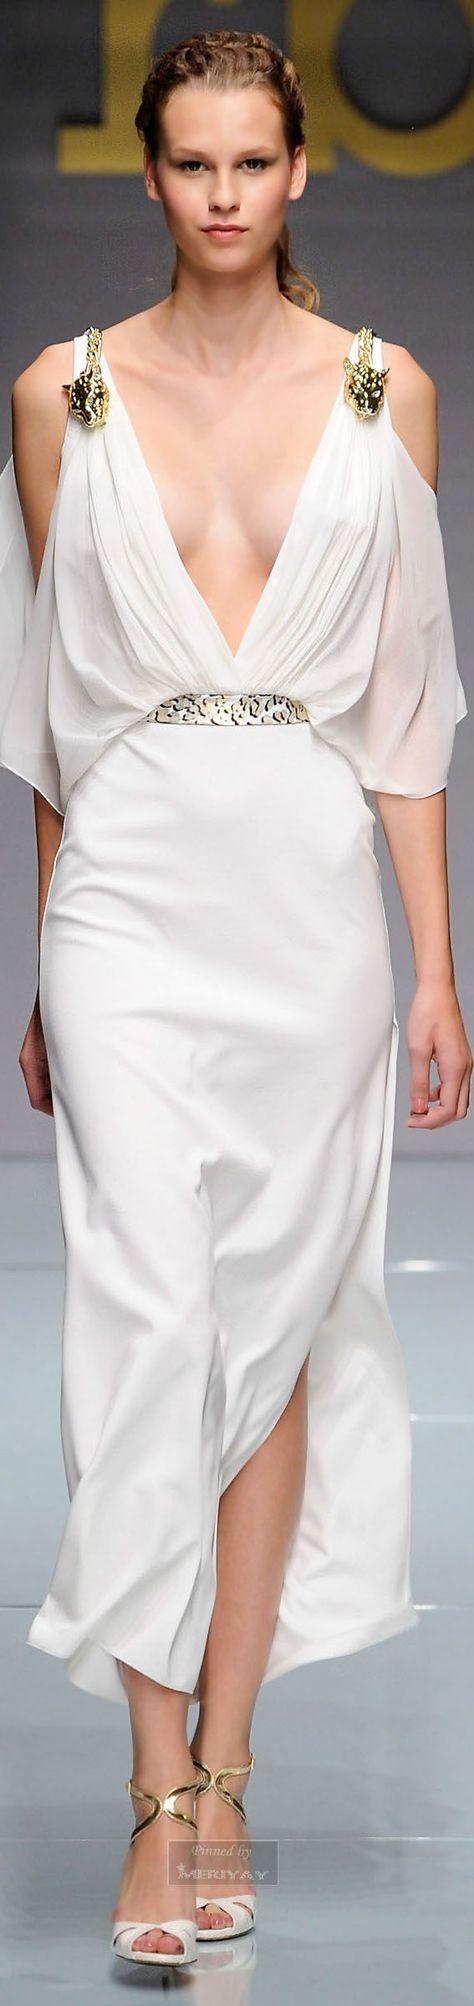 Glamour gowns / karen cox.  Roccobarocco - Spring Summer 2015.